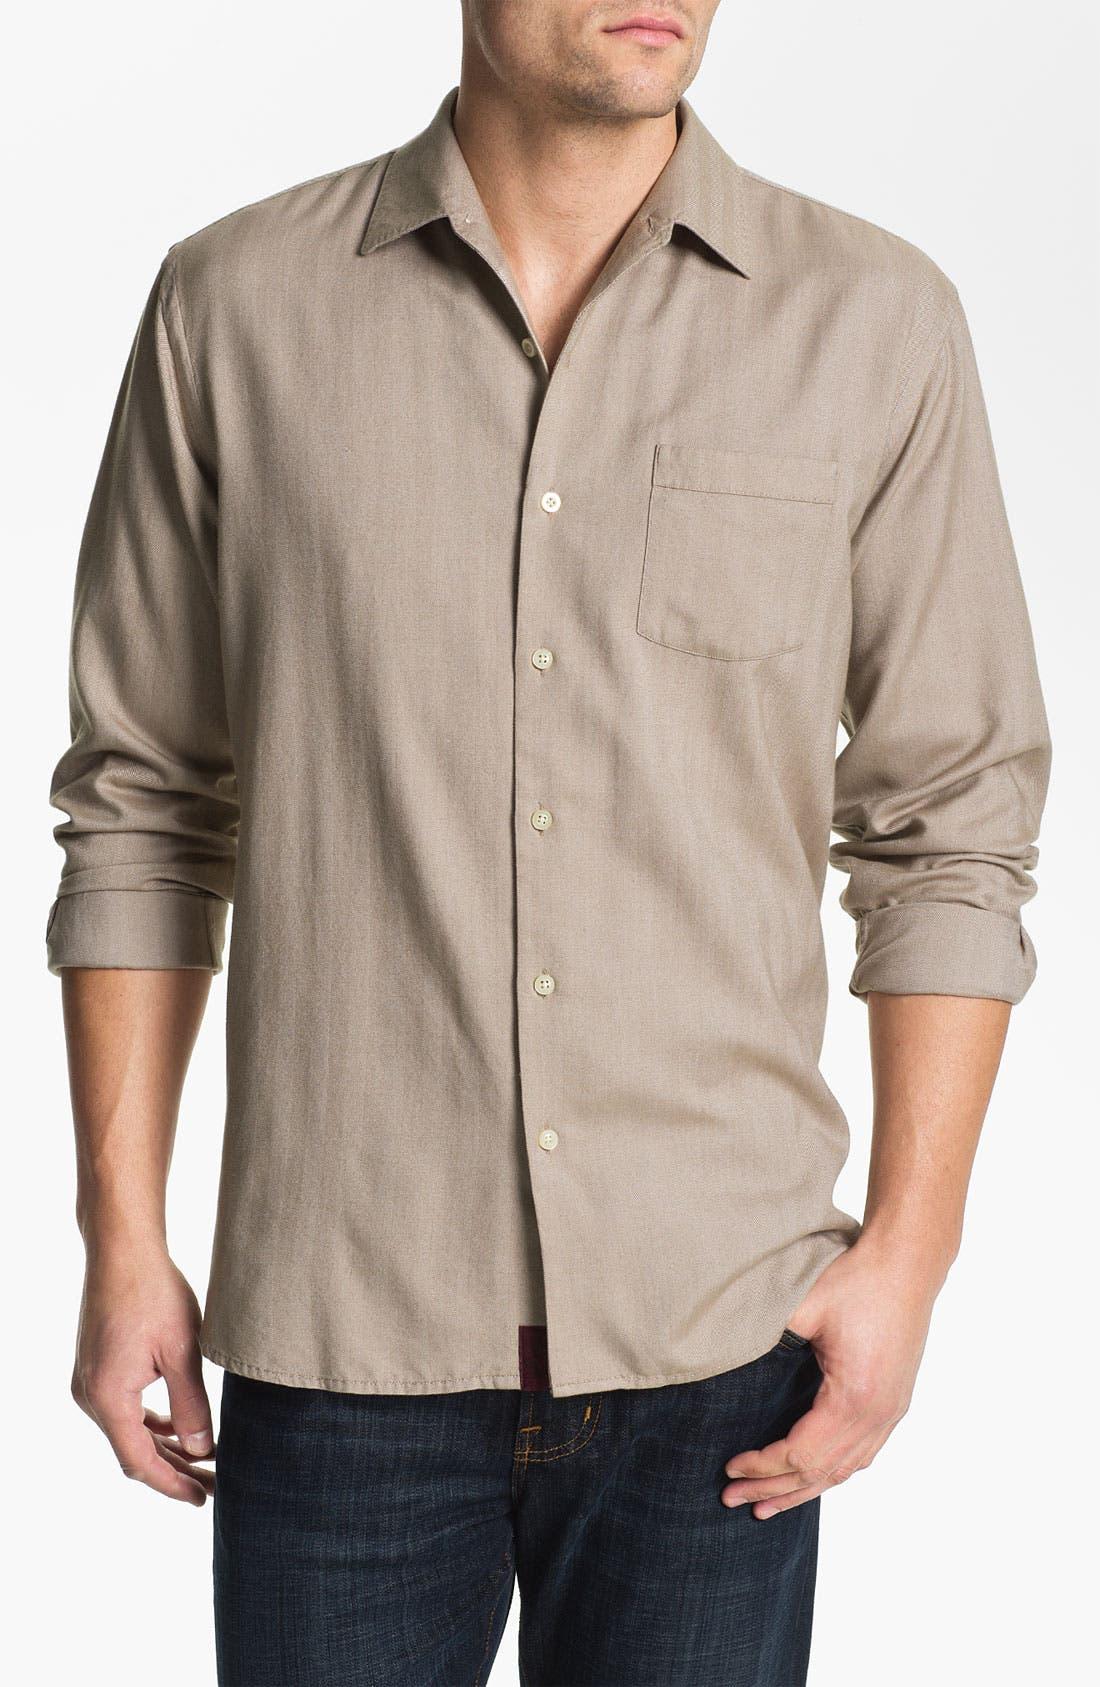 Alternate Image 1 Selected - Tommy Bahama 'Harbor Island' Silk & Cotton Sport Shirt (Big & Tall)